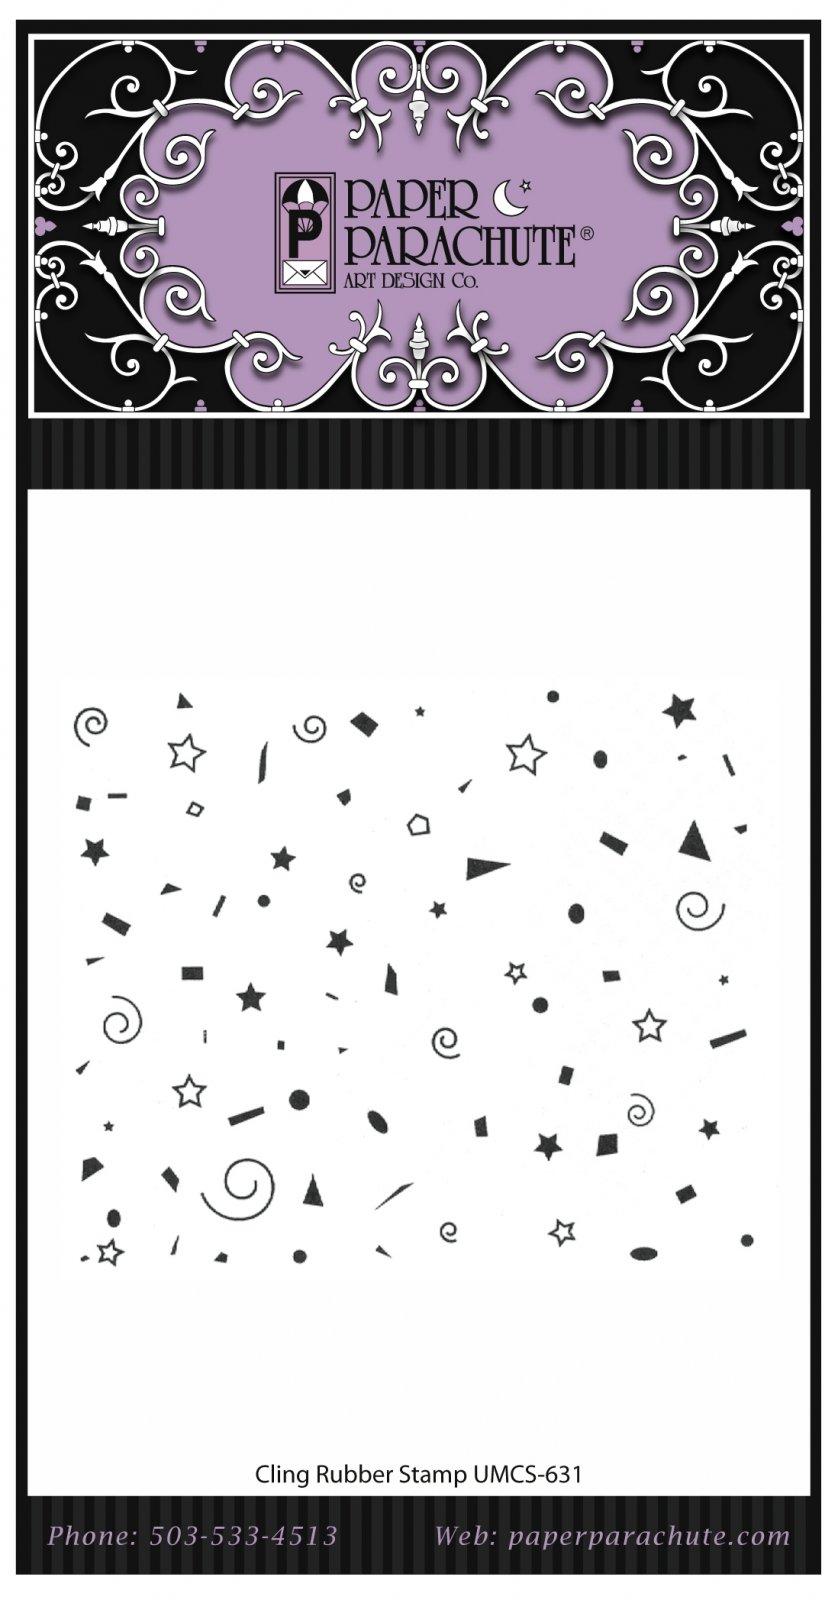 Paper Parachute Rubber Stamp - UMCS631